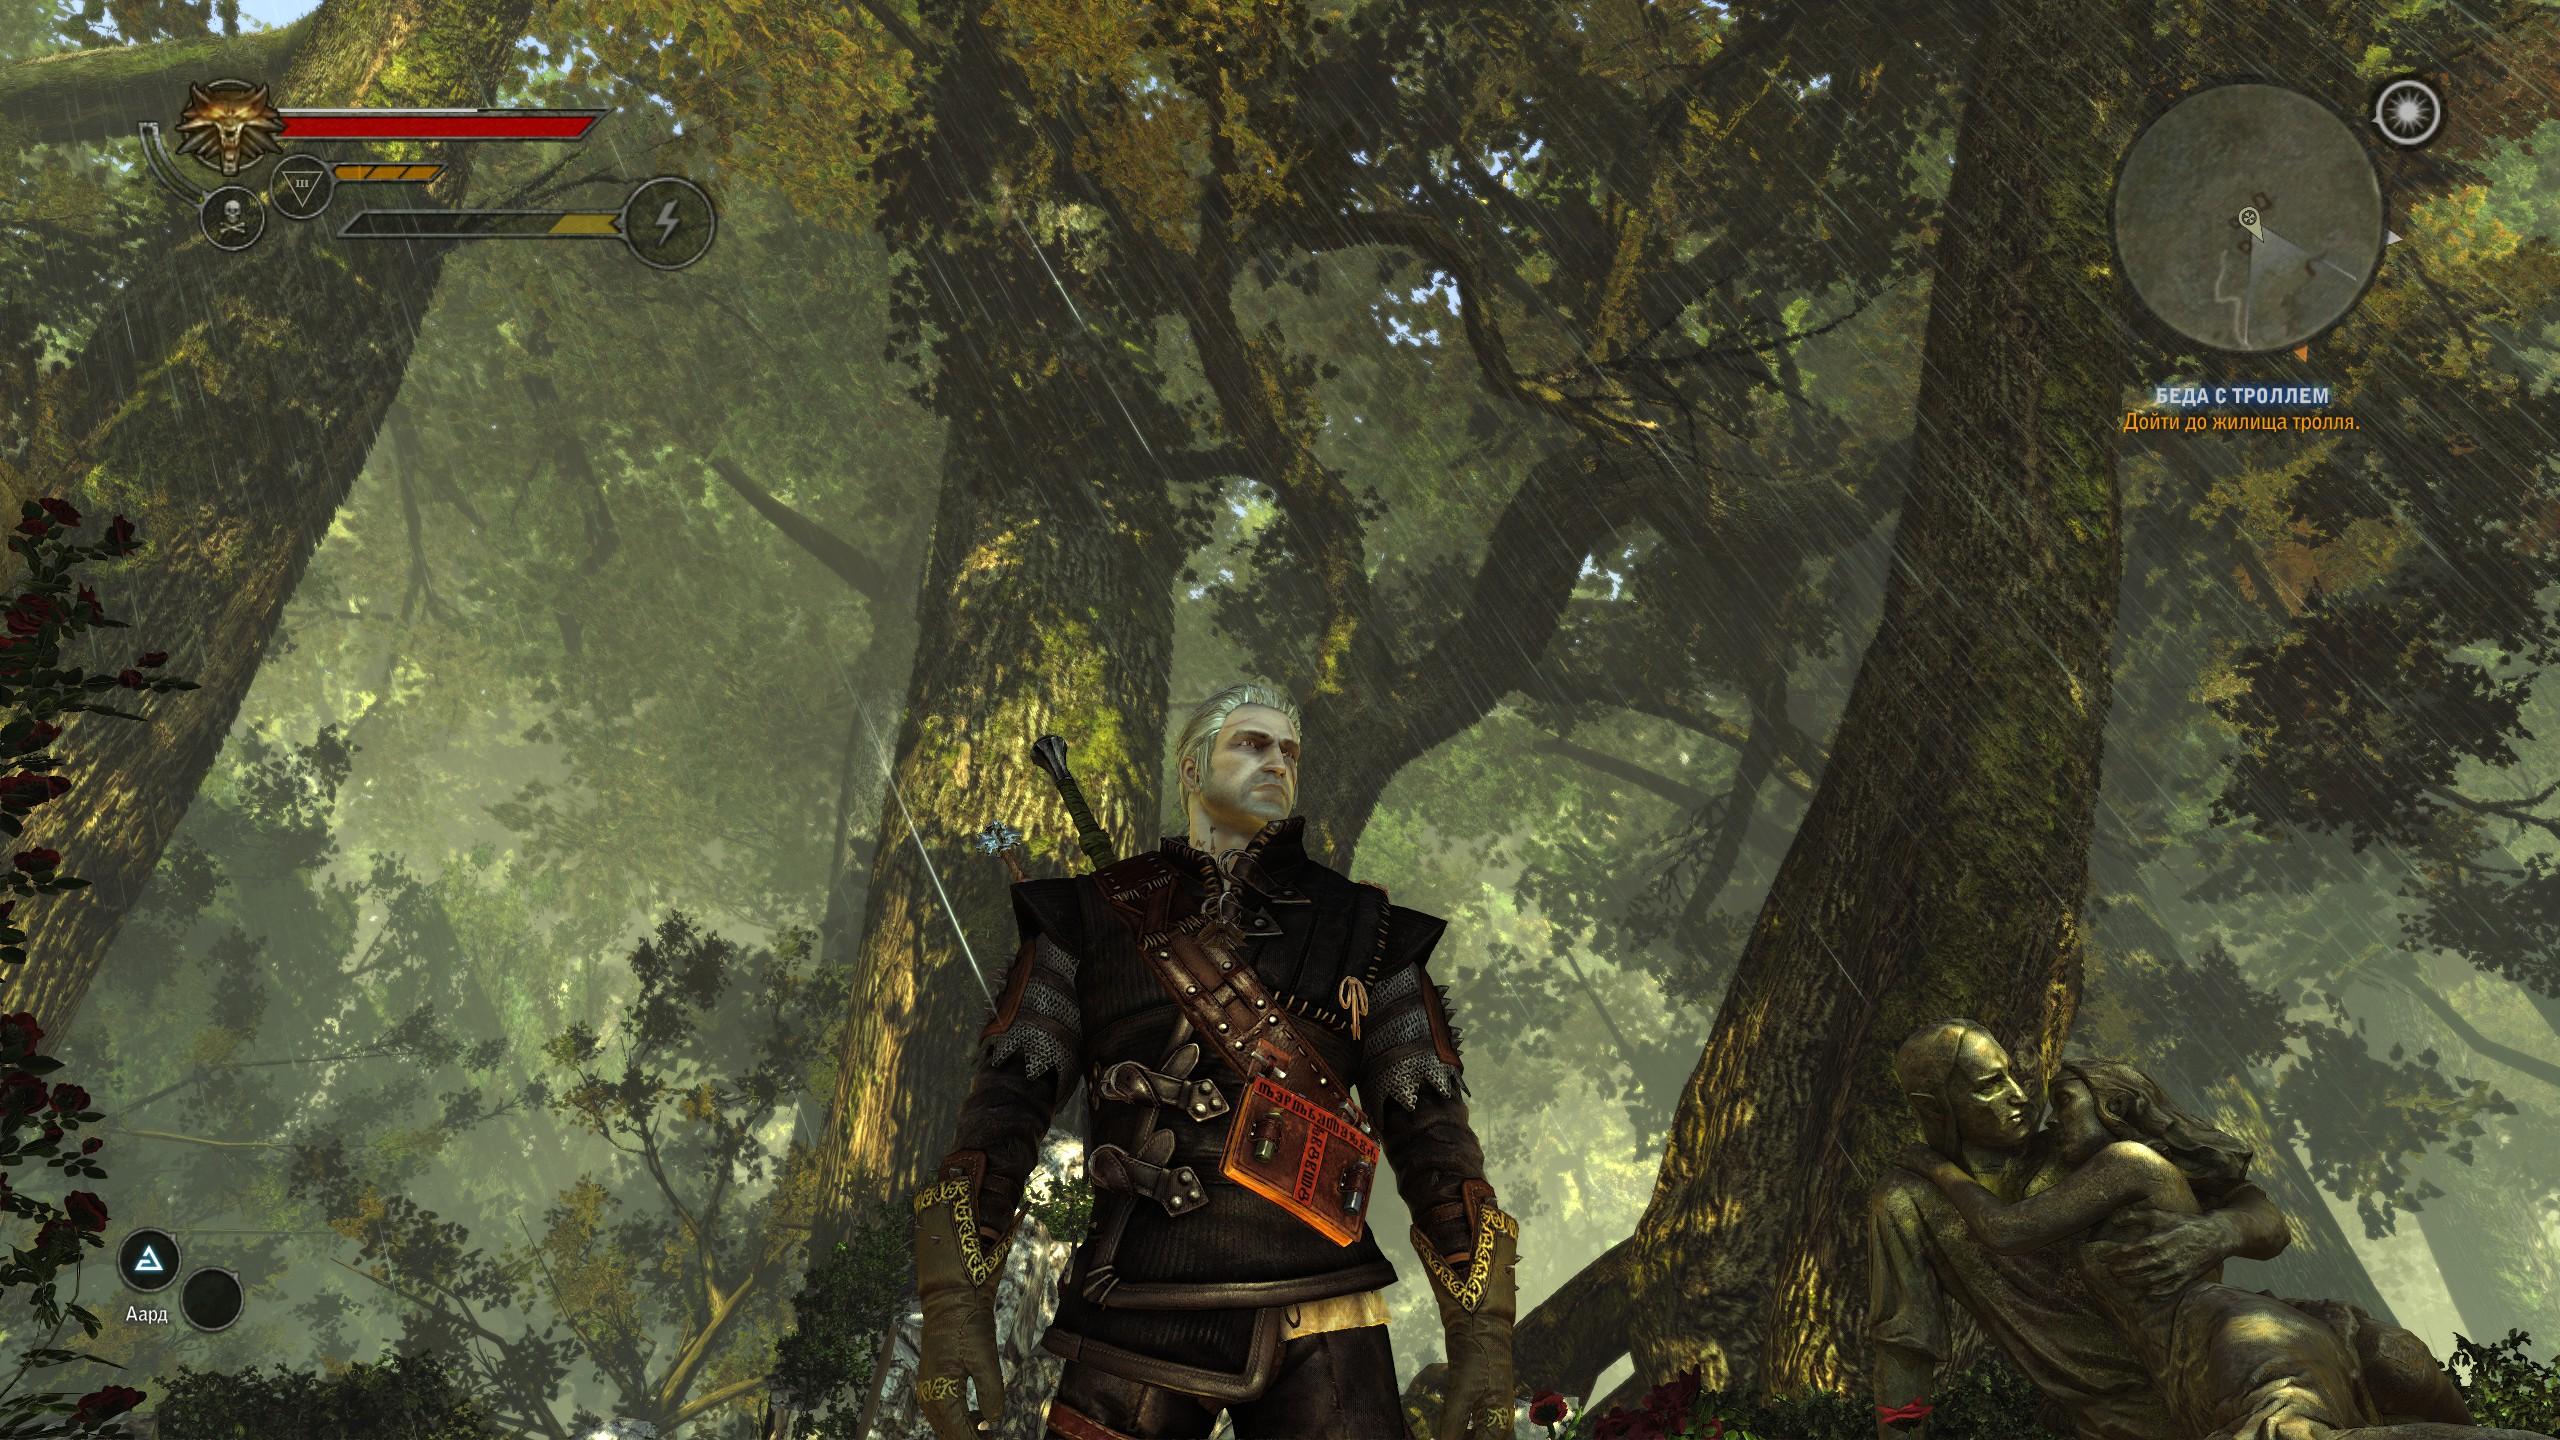 Дождики в лесу - Witcher 2: Assassins of Kings, the